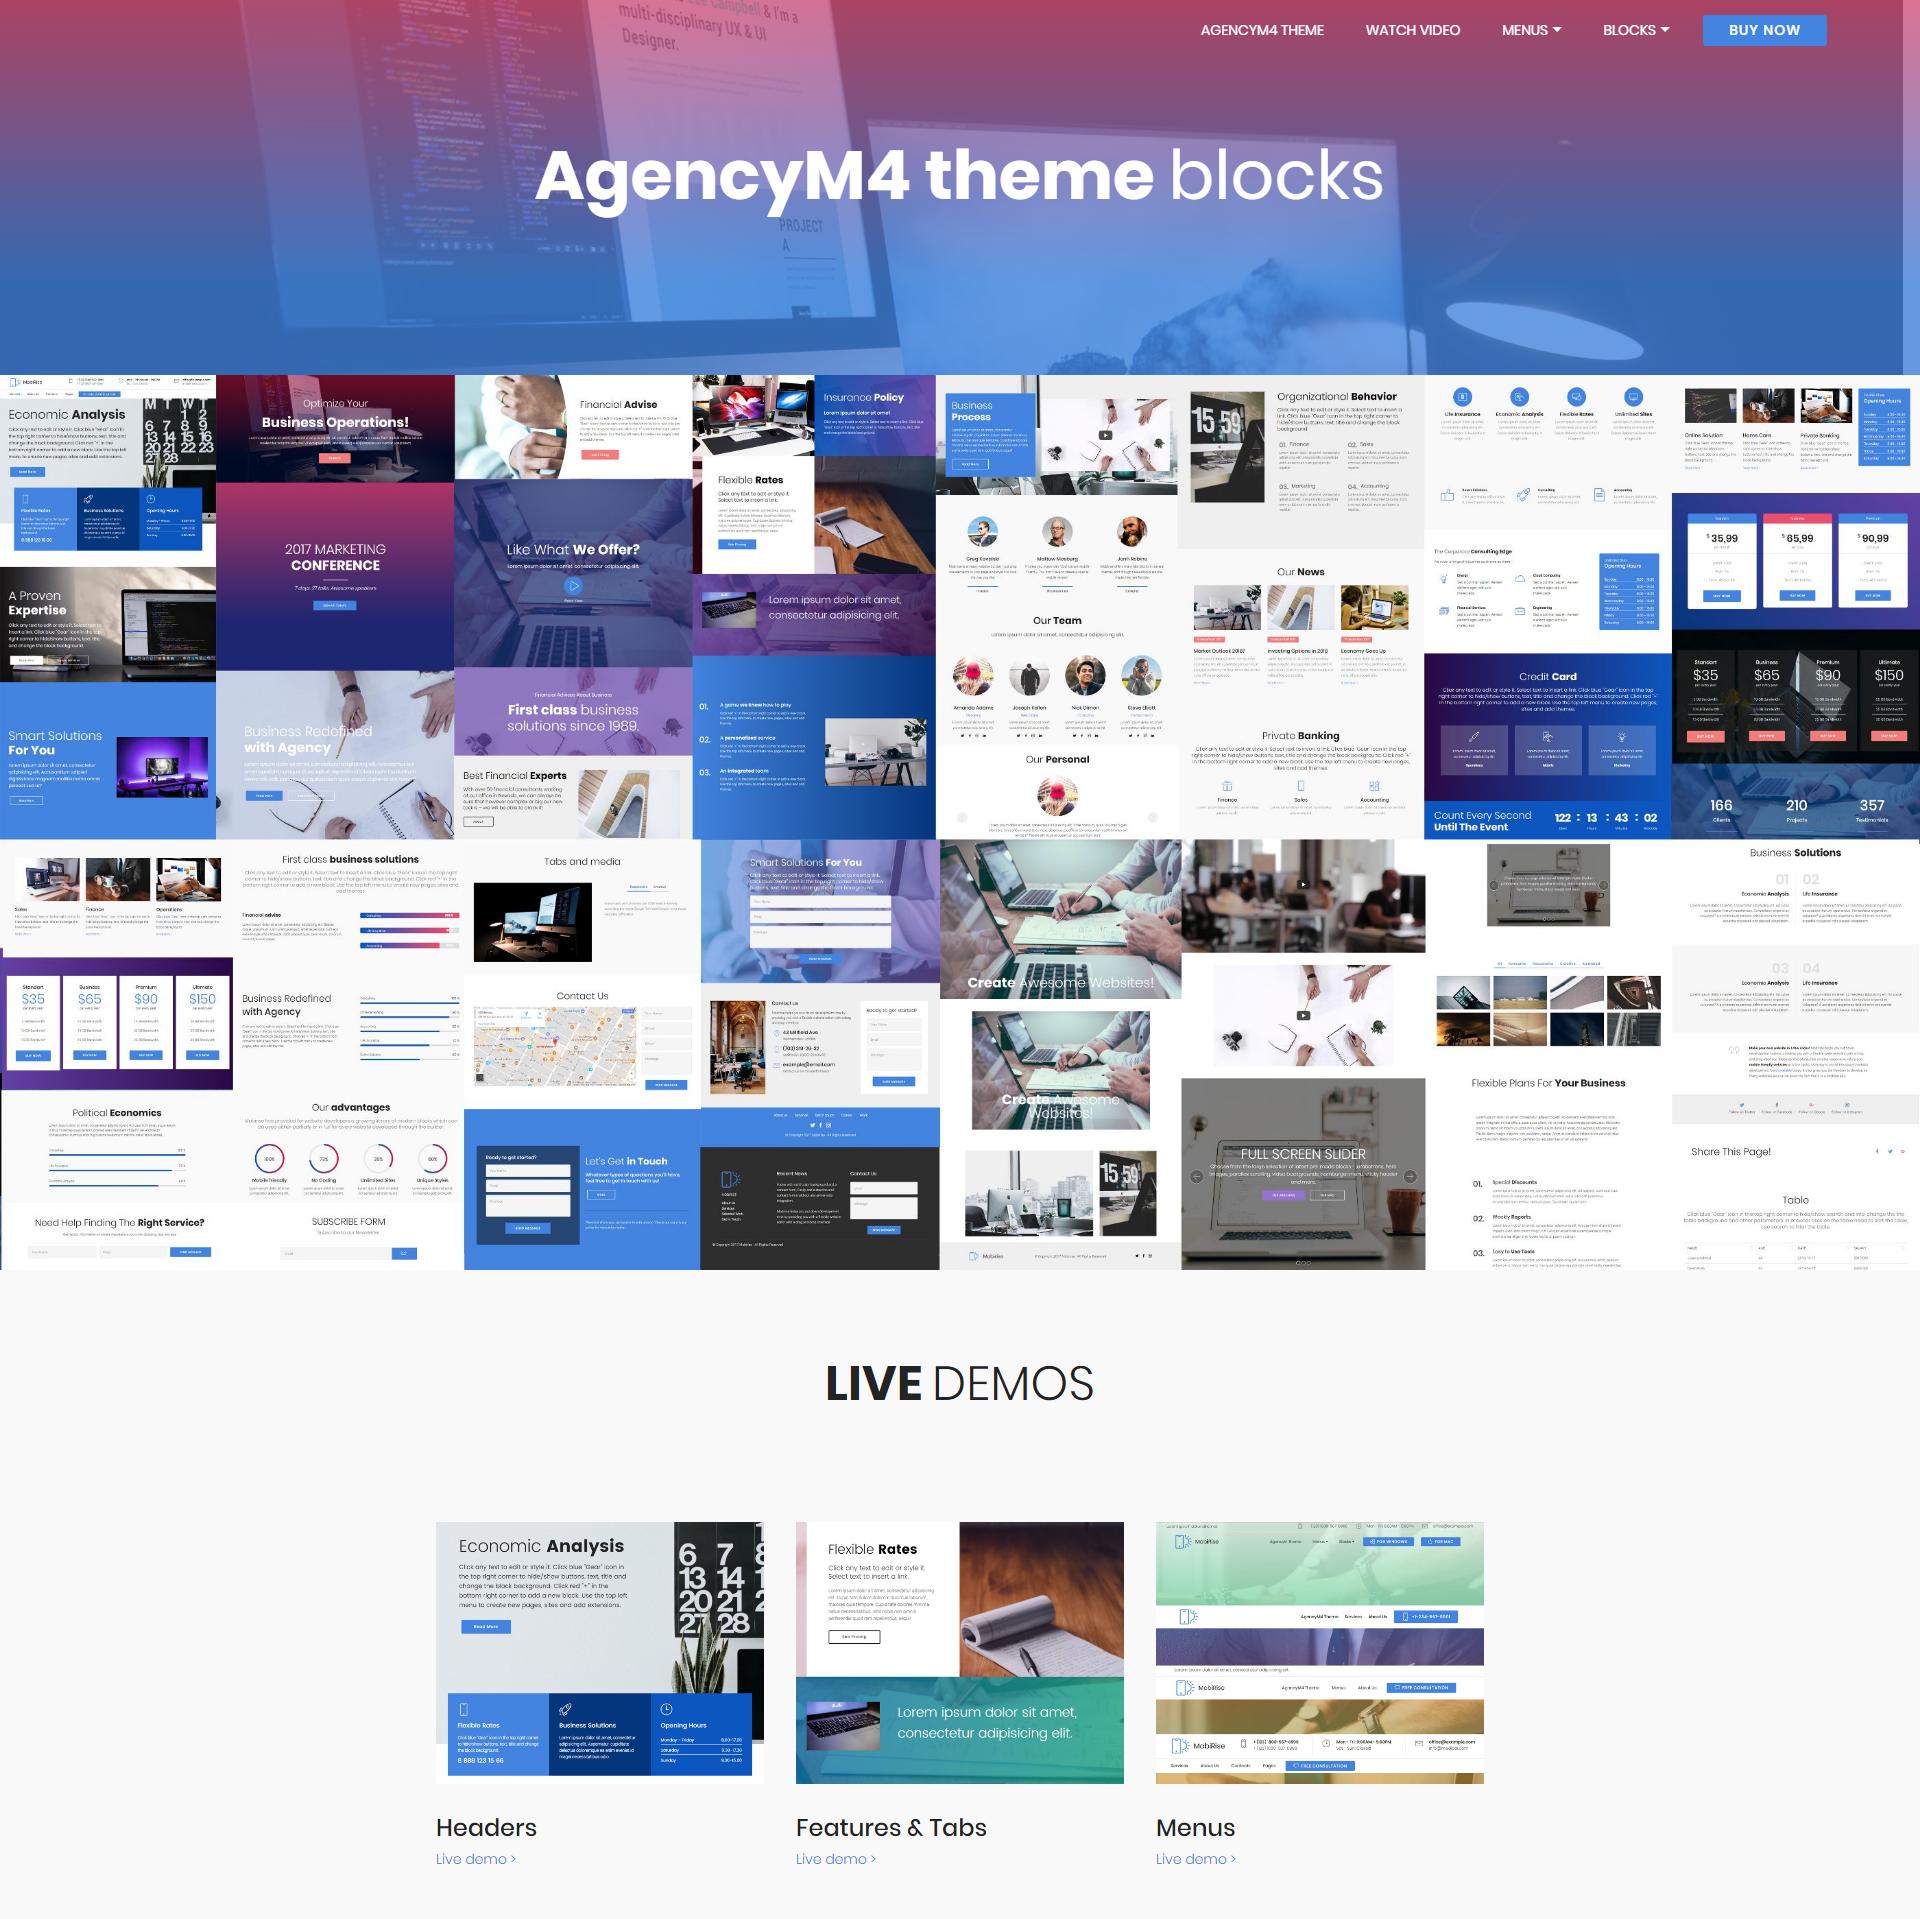 AgencyM4 Theme Bootstrap Blocks